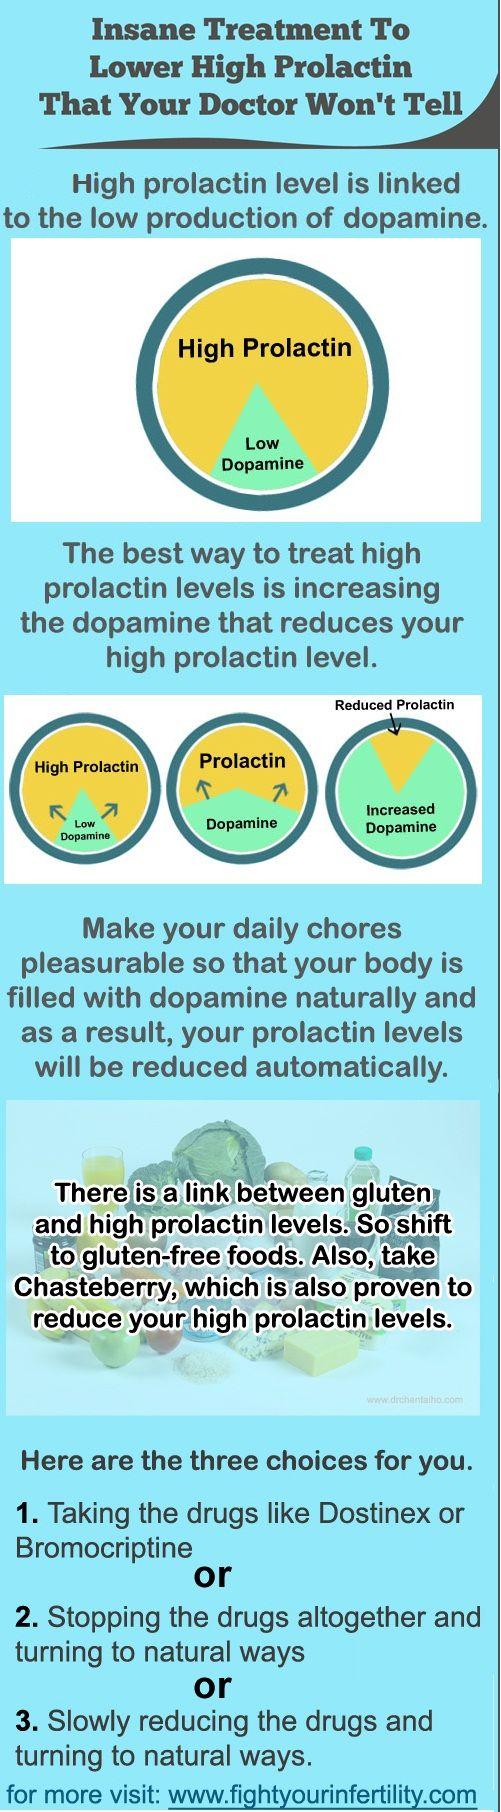 High Prolactin Levels, can high prolactin levels cause infertility, high prolactin levels ovulation, high prolactin levels menstrual cycle, high prolactin levels symptoms, can high prolactin levels cause anxiety, can high prolactin levels cause depression, high prolactin levels dopamine, low production of dopamine, decreased production of dopamine, treat high prolactin levels, increasing dopamine levels, high prolactin levels treatment, how to reduce high prolactin levels naturally, foods…